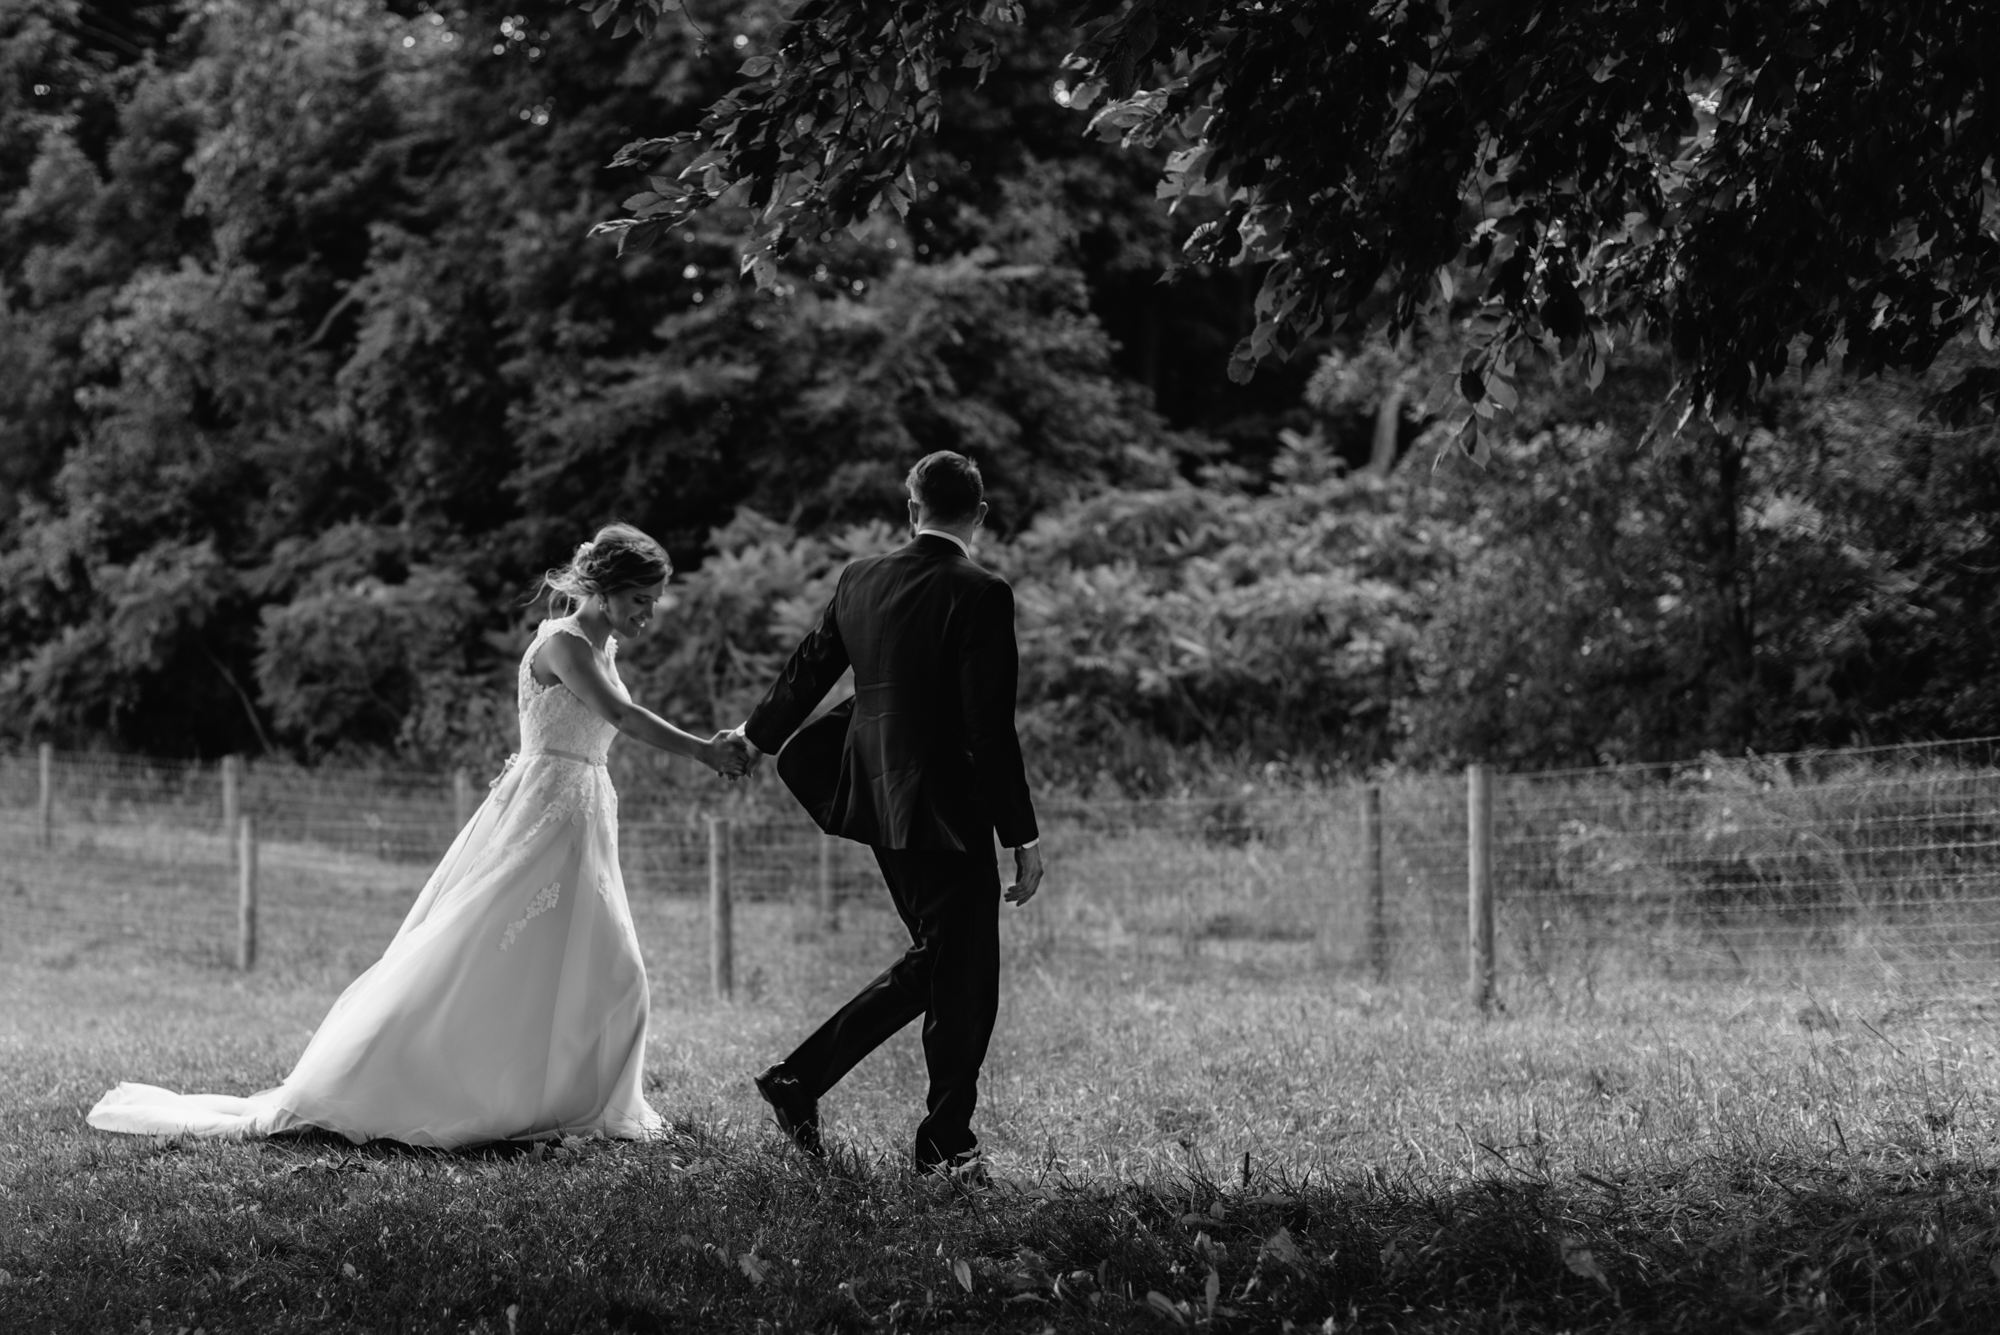 creative-minneapolis-wedding-photographer-1-4.jpg